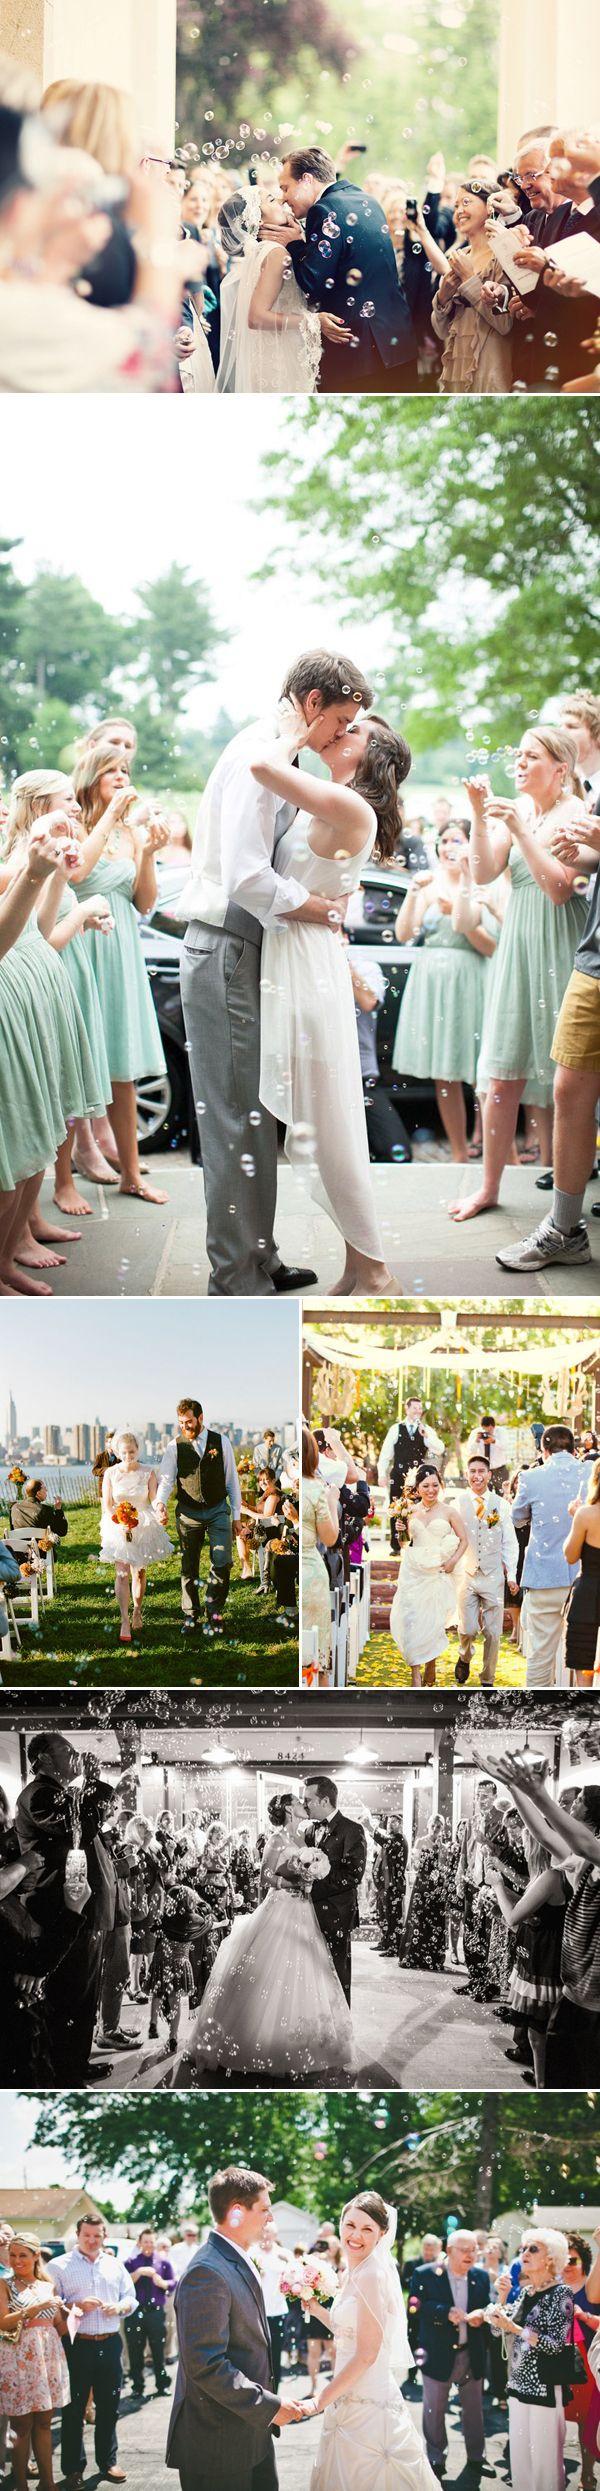 "Bubble Wedding Exit Ideas   |   ""30 Creative Wedding Exit Ideas"" (http://www.praisewedding.com/archives/2775)"